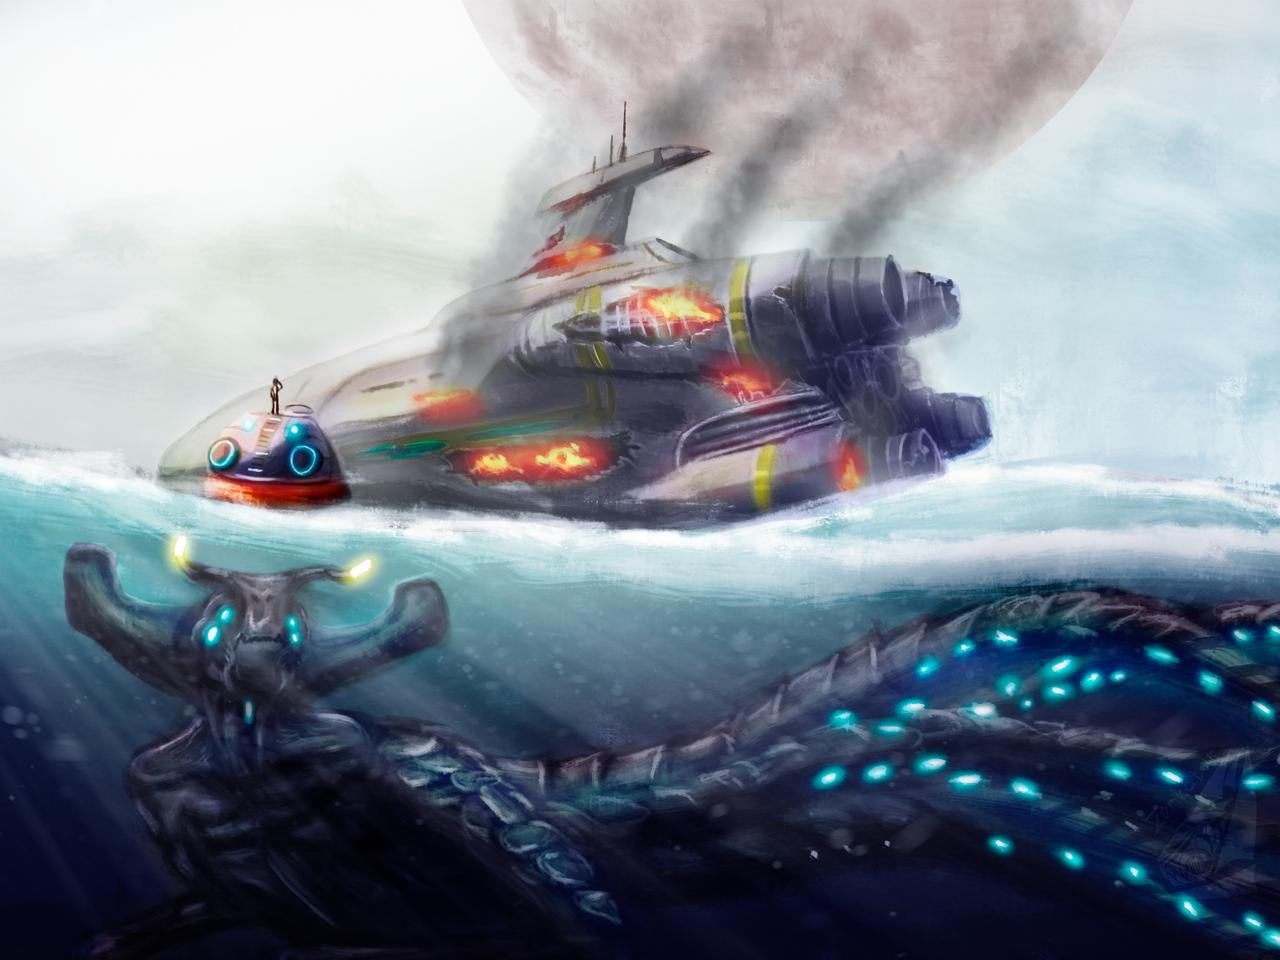 Subnautica fan art Illust of ℤ𝕖𝕟𝕜𝕒𝕥𝕒𝕣 medibangpaint monster fanart realistic gameart